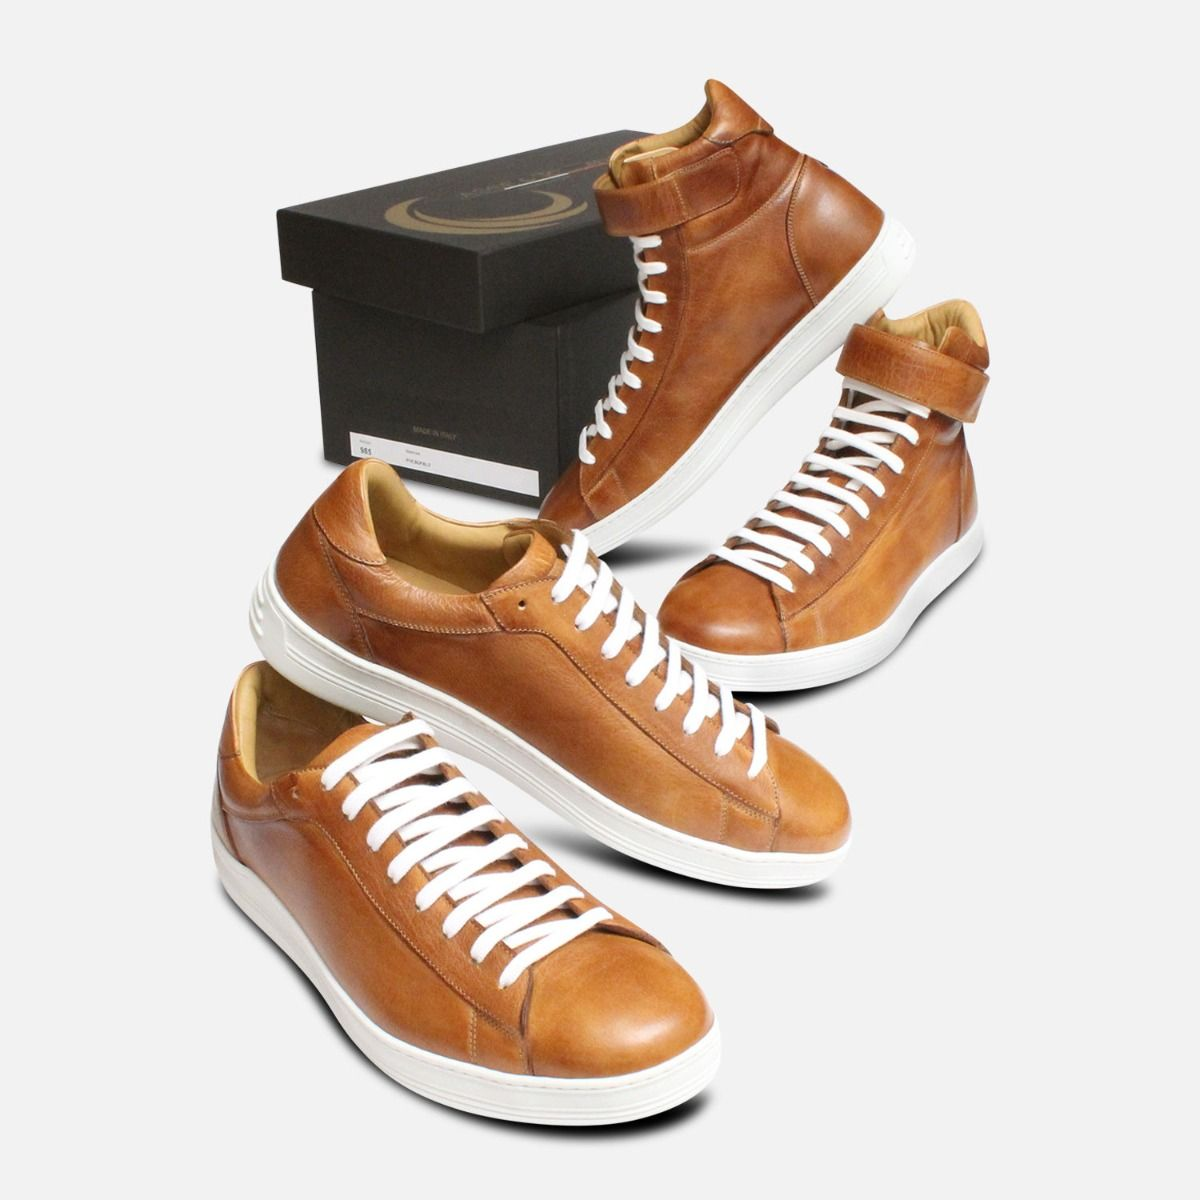 4a36e7aa08a Luxury Buffalino Leather Designer Sneakers